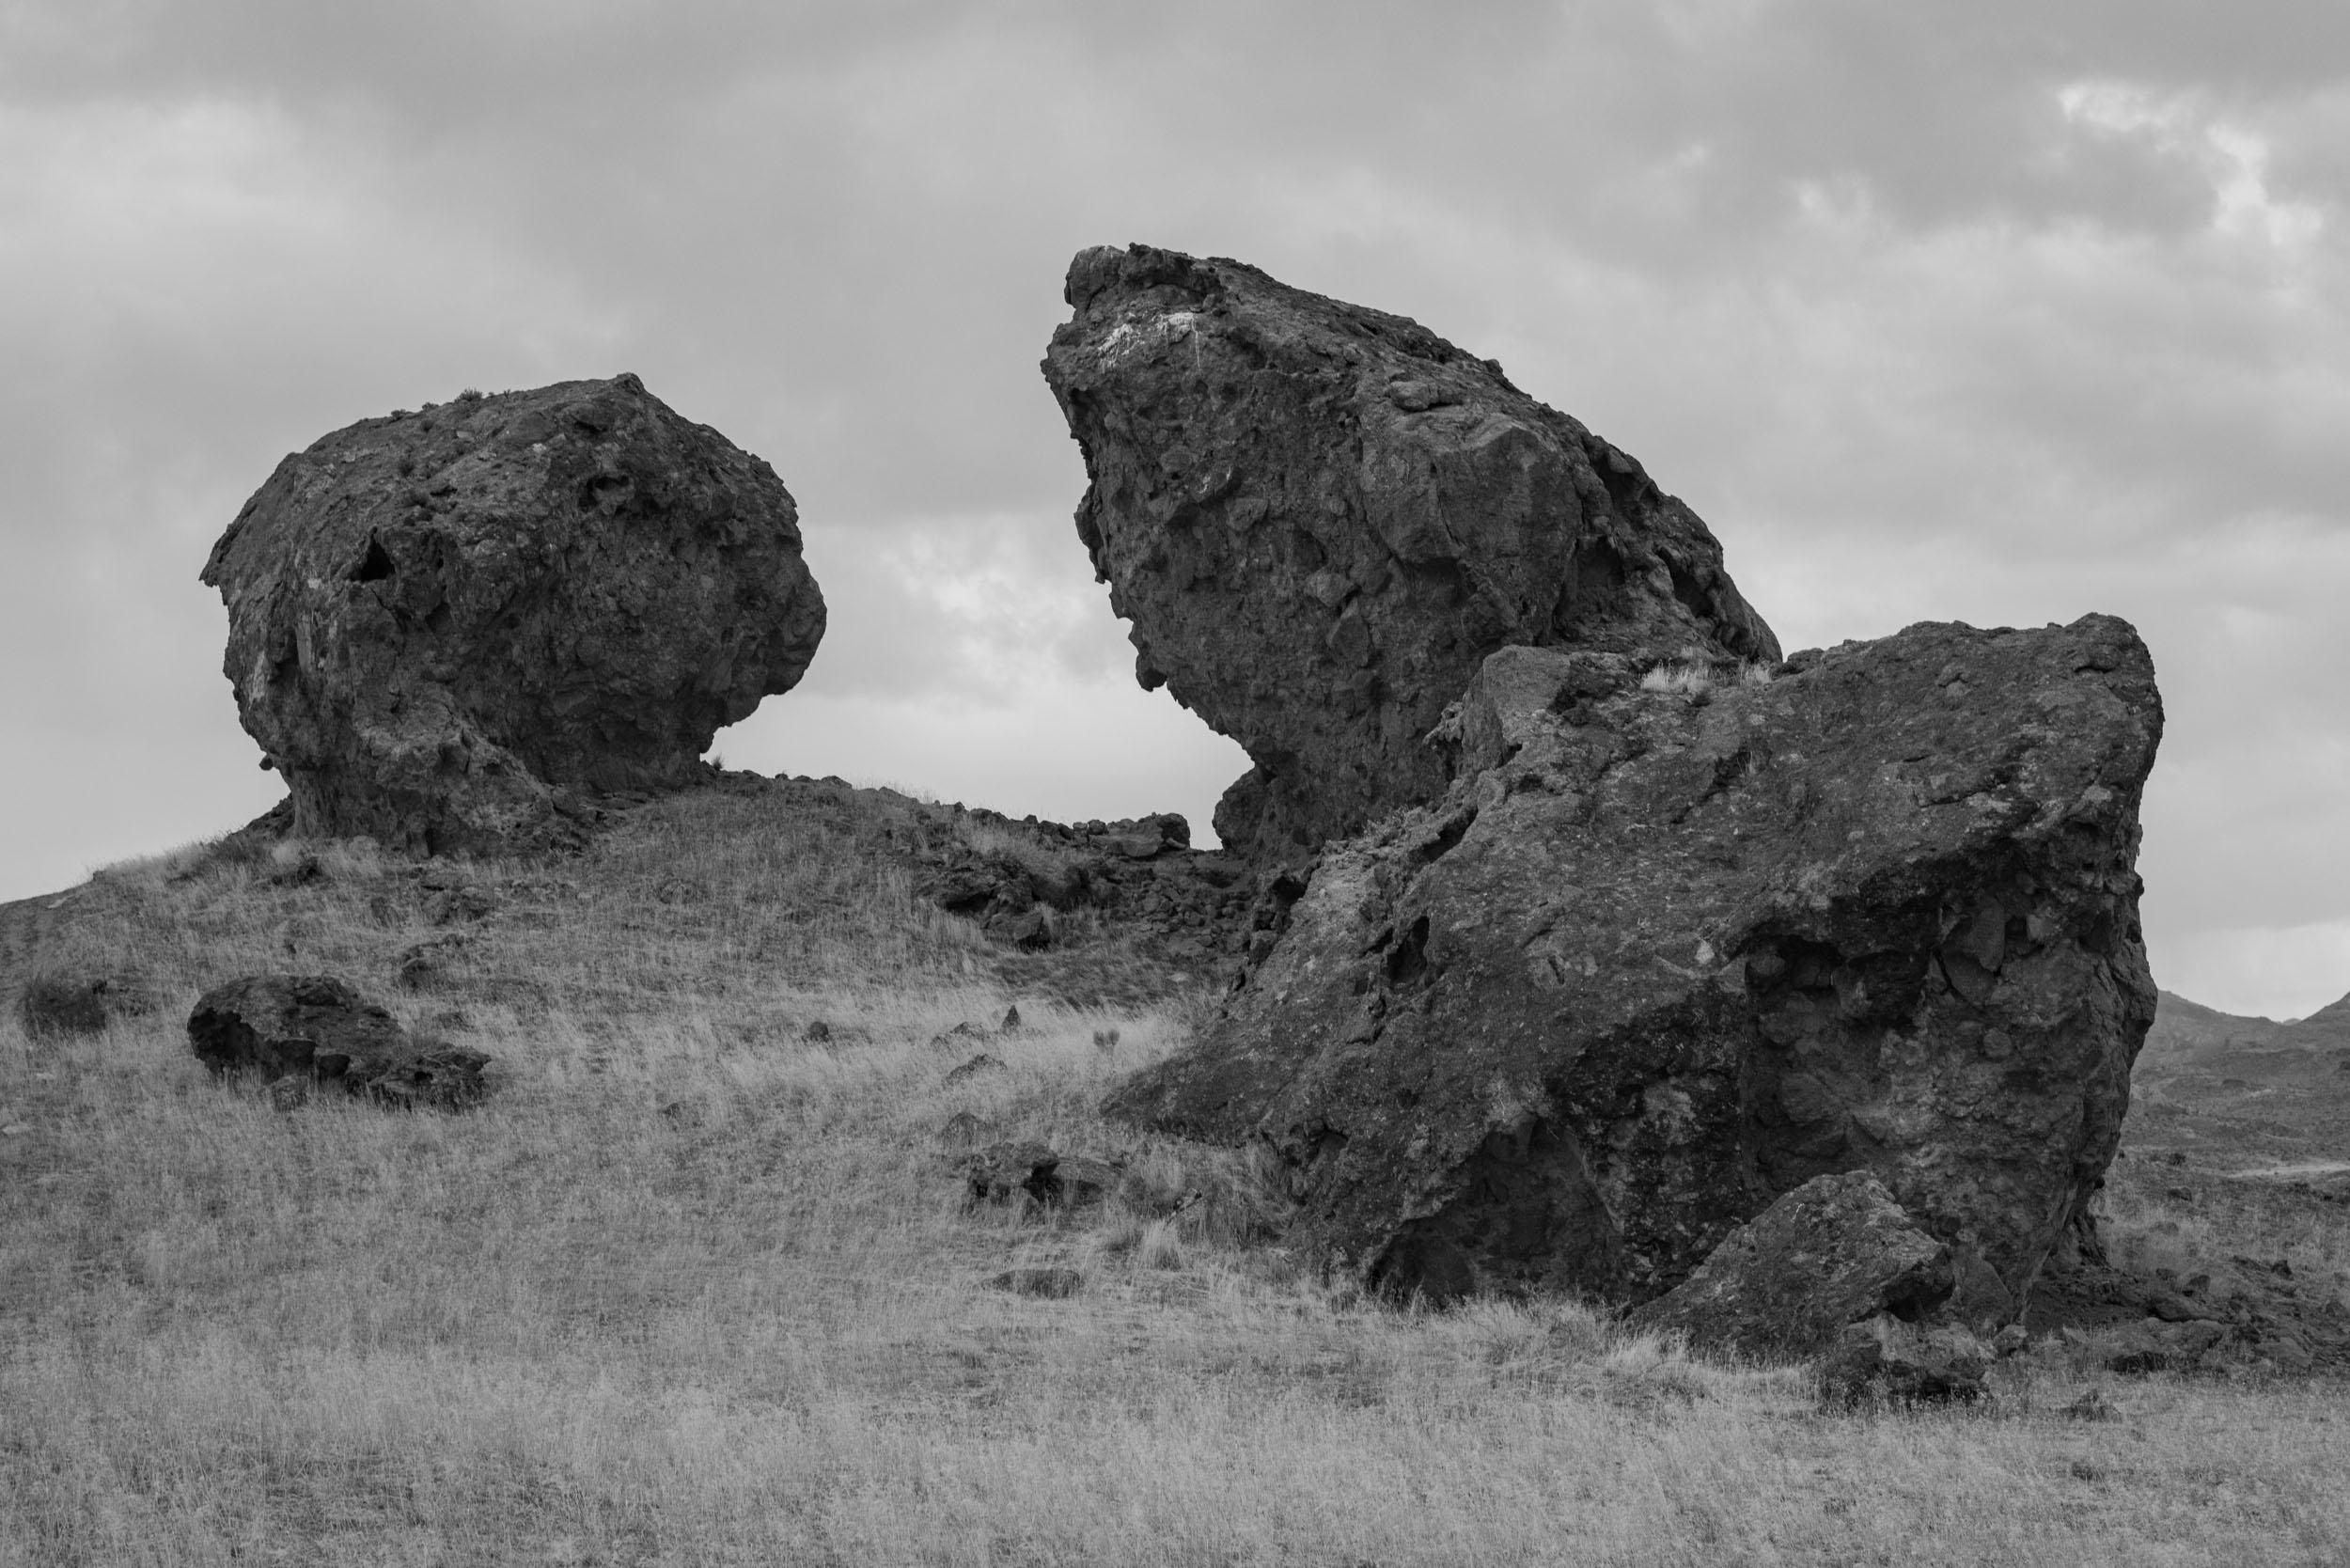 Calcium carbonate tufa deposits coat the shorelines of Pleistocene Lake Bonneville near the west side of the Silver Island Range near the Nevada-Utah border.